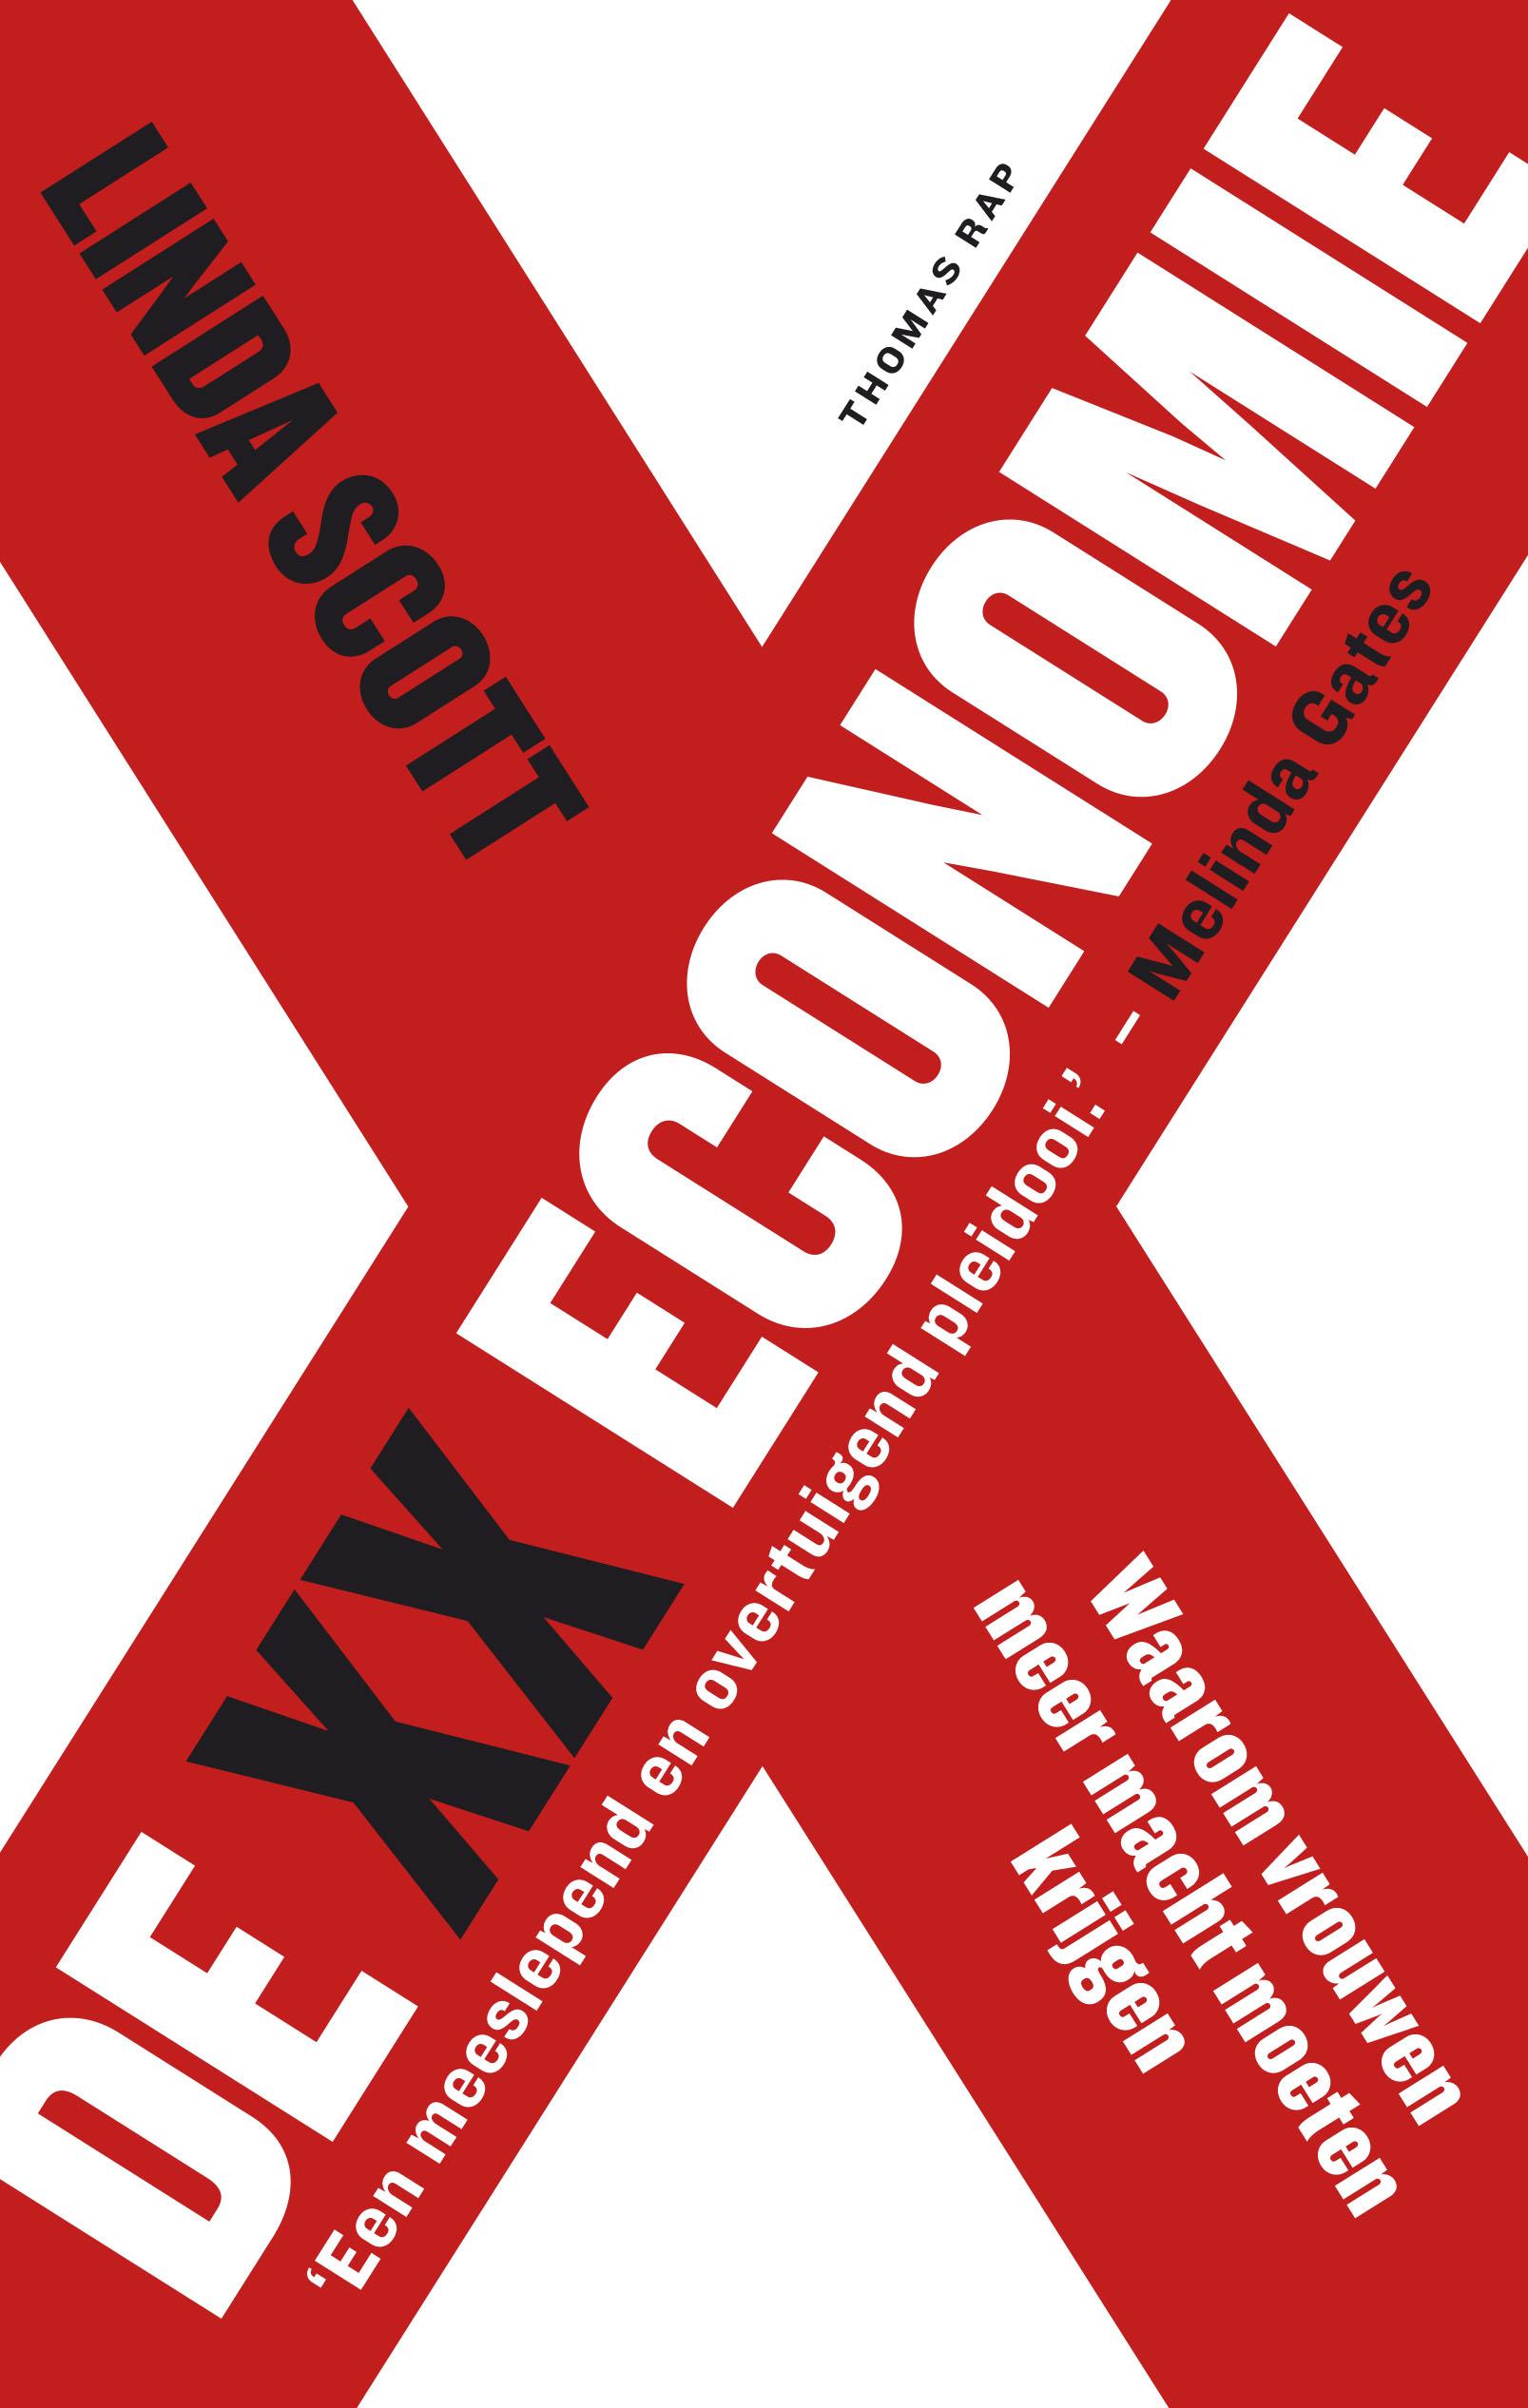 De XX economie